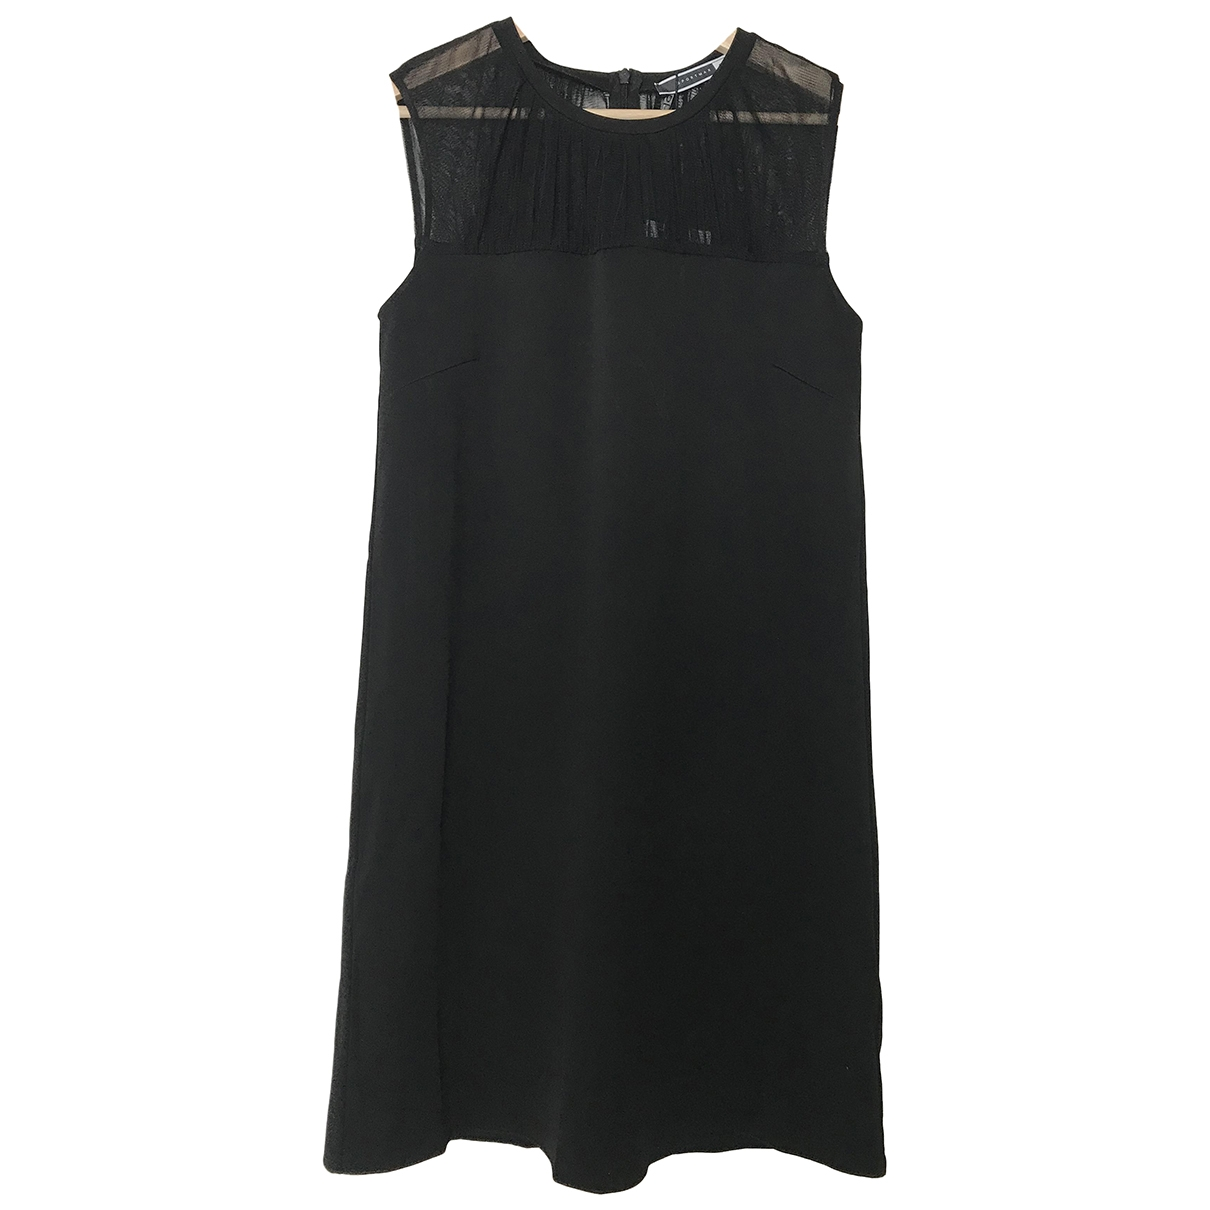 Sport Max \N Kleid in  Schwarz Synthetik